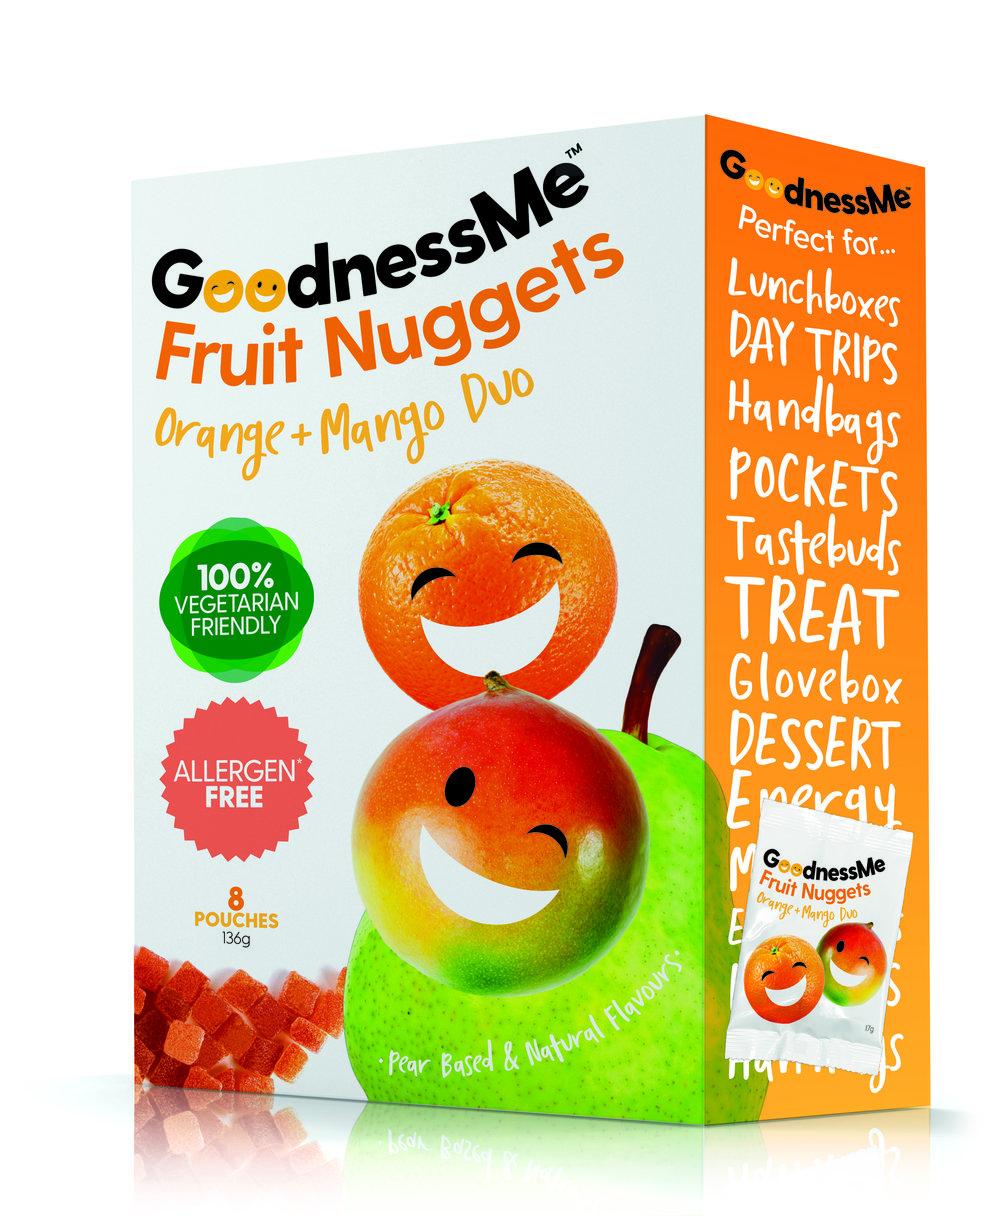 NZGF-GoodnessMe-Fruit-Nuggests-Pack-Orange-Mango.jpg